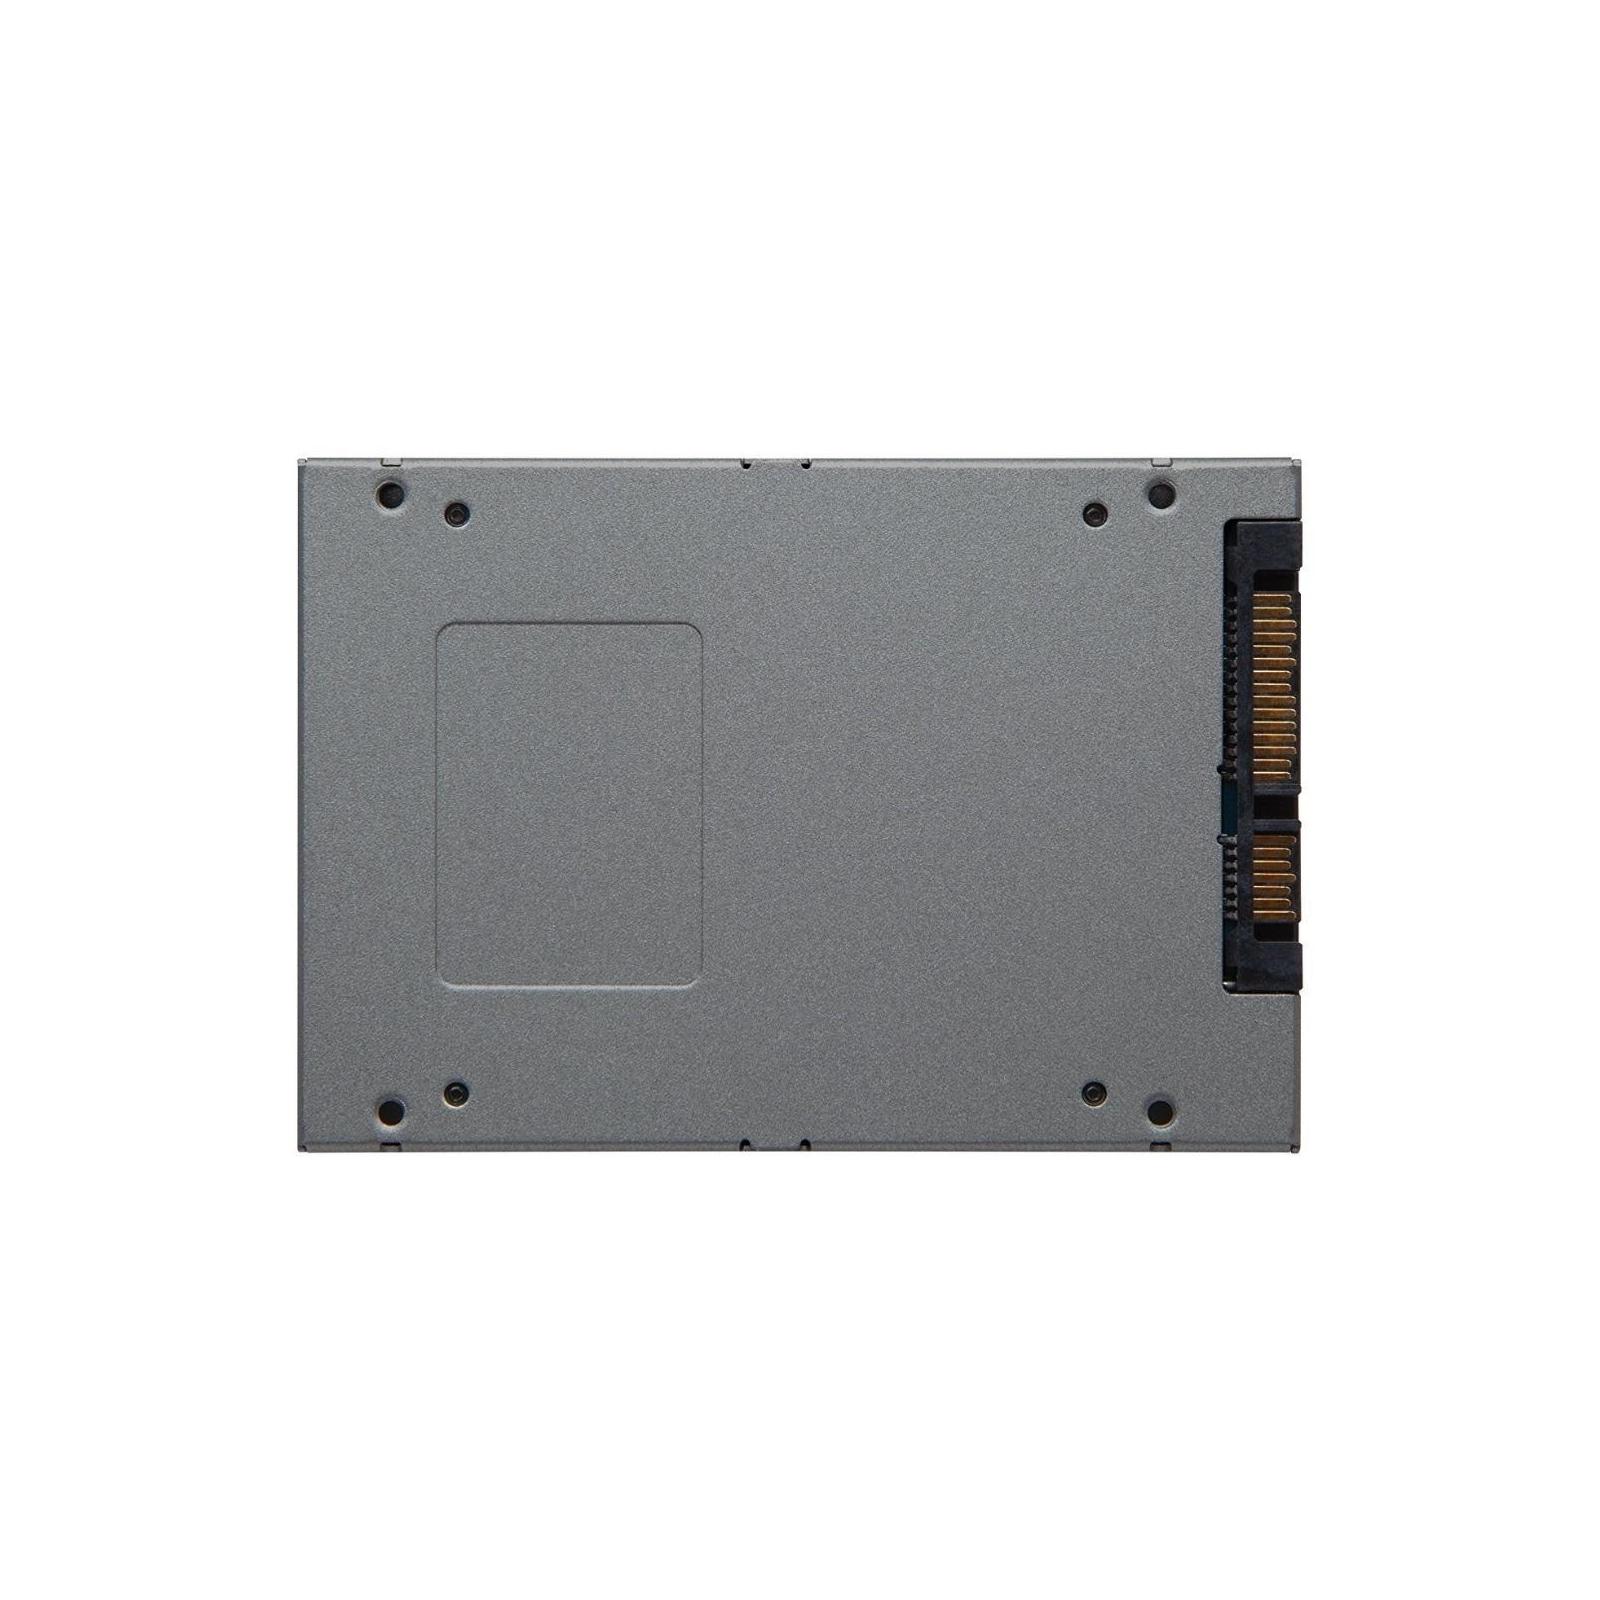 "Накопитель SSD 2.5"" 1.92TB Kingston (SUV500/1920G) изображение 3"